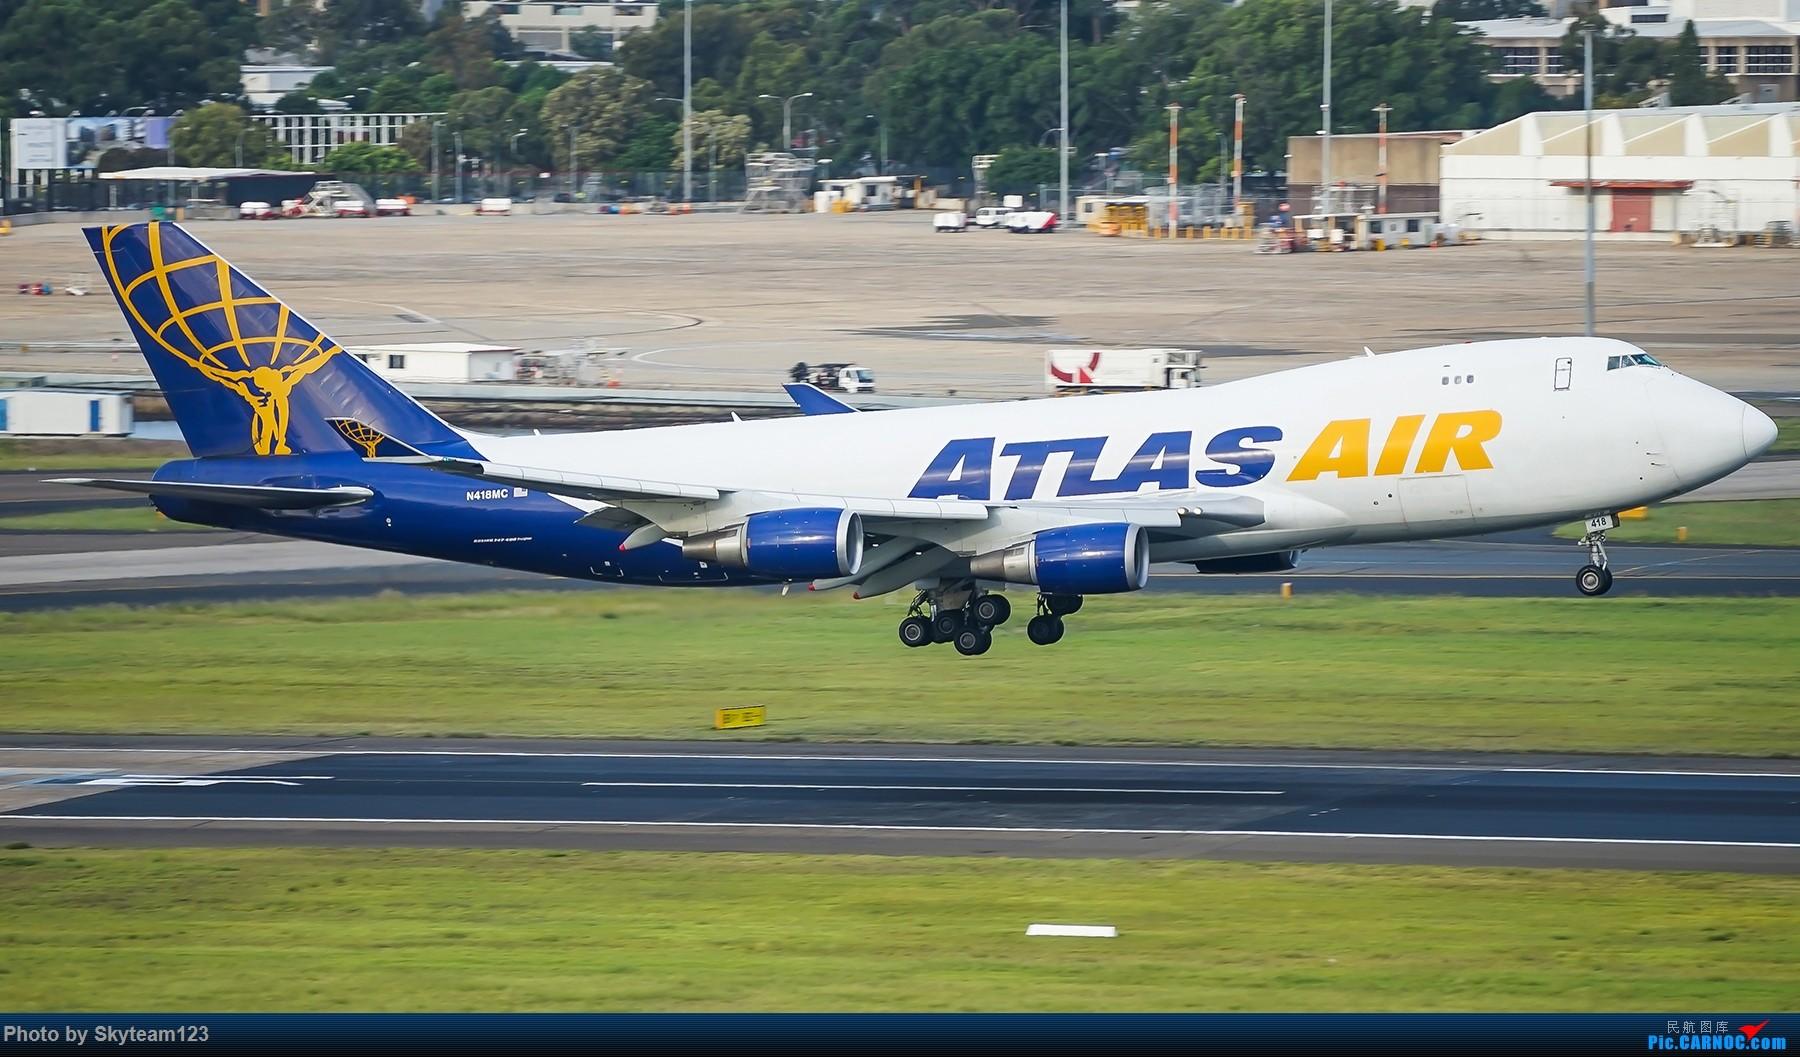 Re:[原创]【SYD】解锁T1国际航站旁停车场顶楼拍机位 下午16R抵达的好货们以及夜拍轨迹 AIRBUS A330-200 VH-EBE